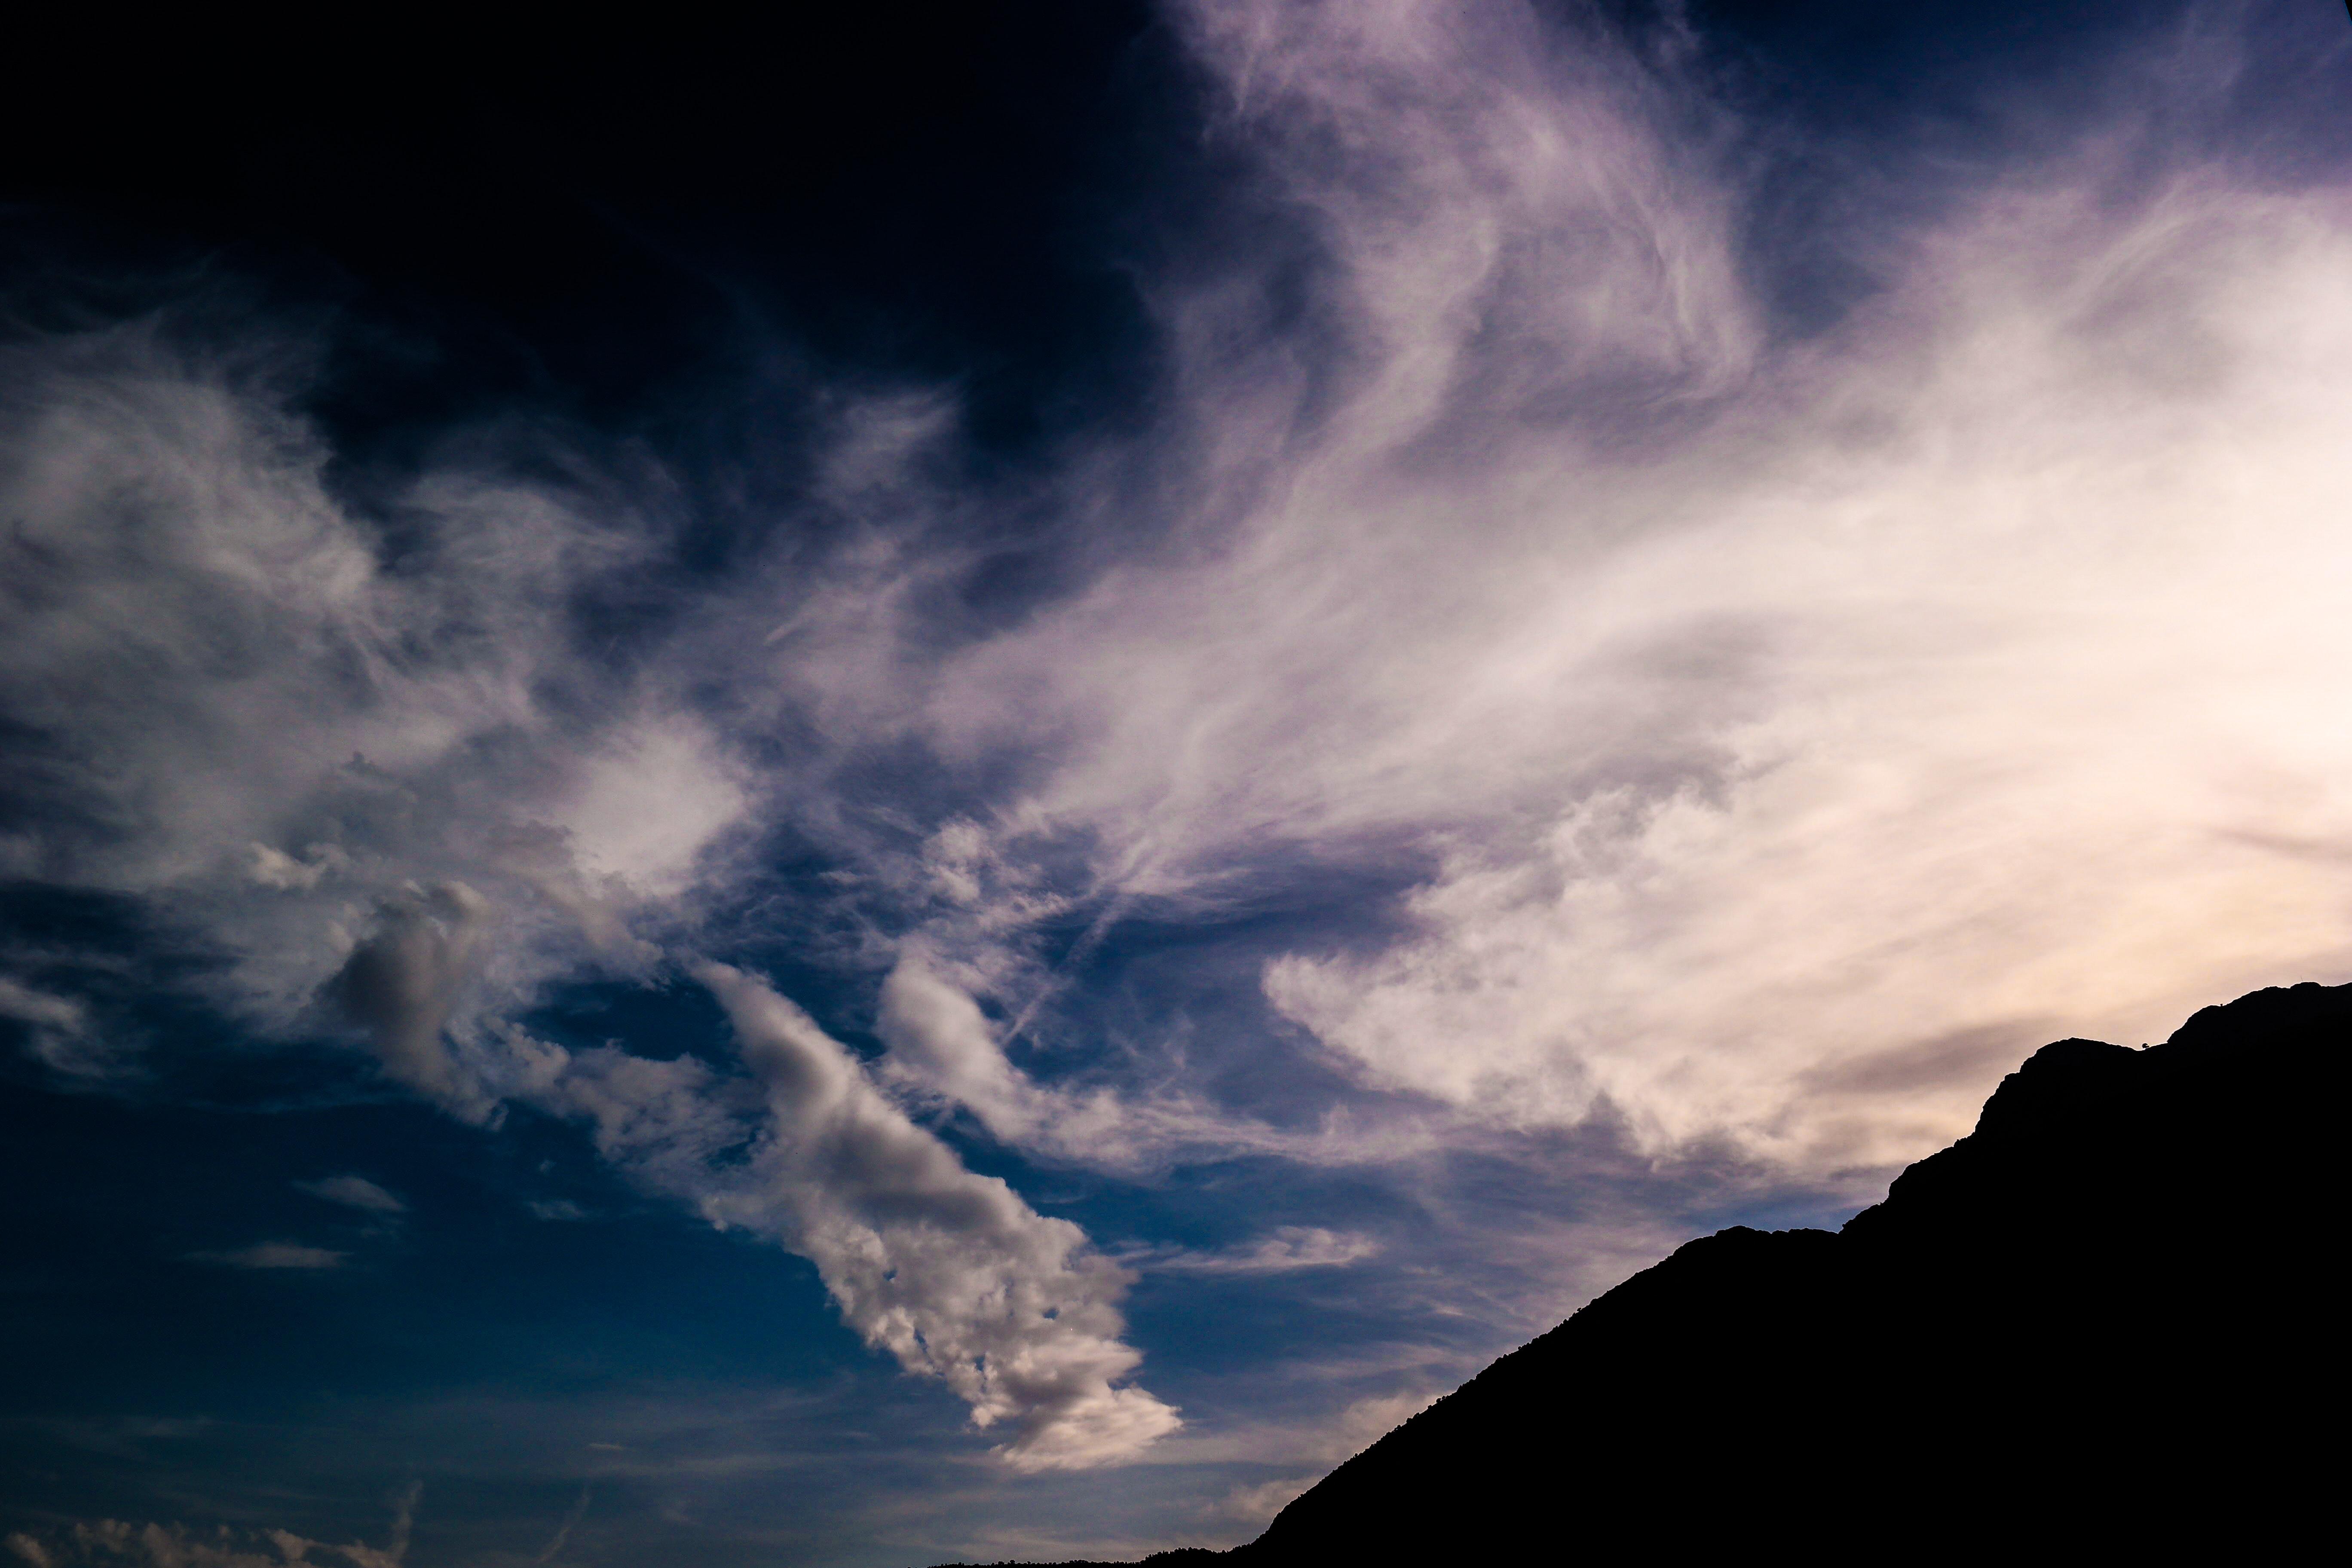 Silhouette of Mountain Under White Clouds, Clouds, Dark, Dawn, Dusk, HQ Photo